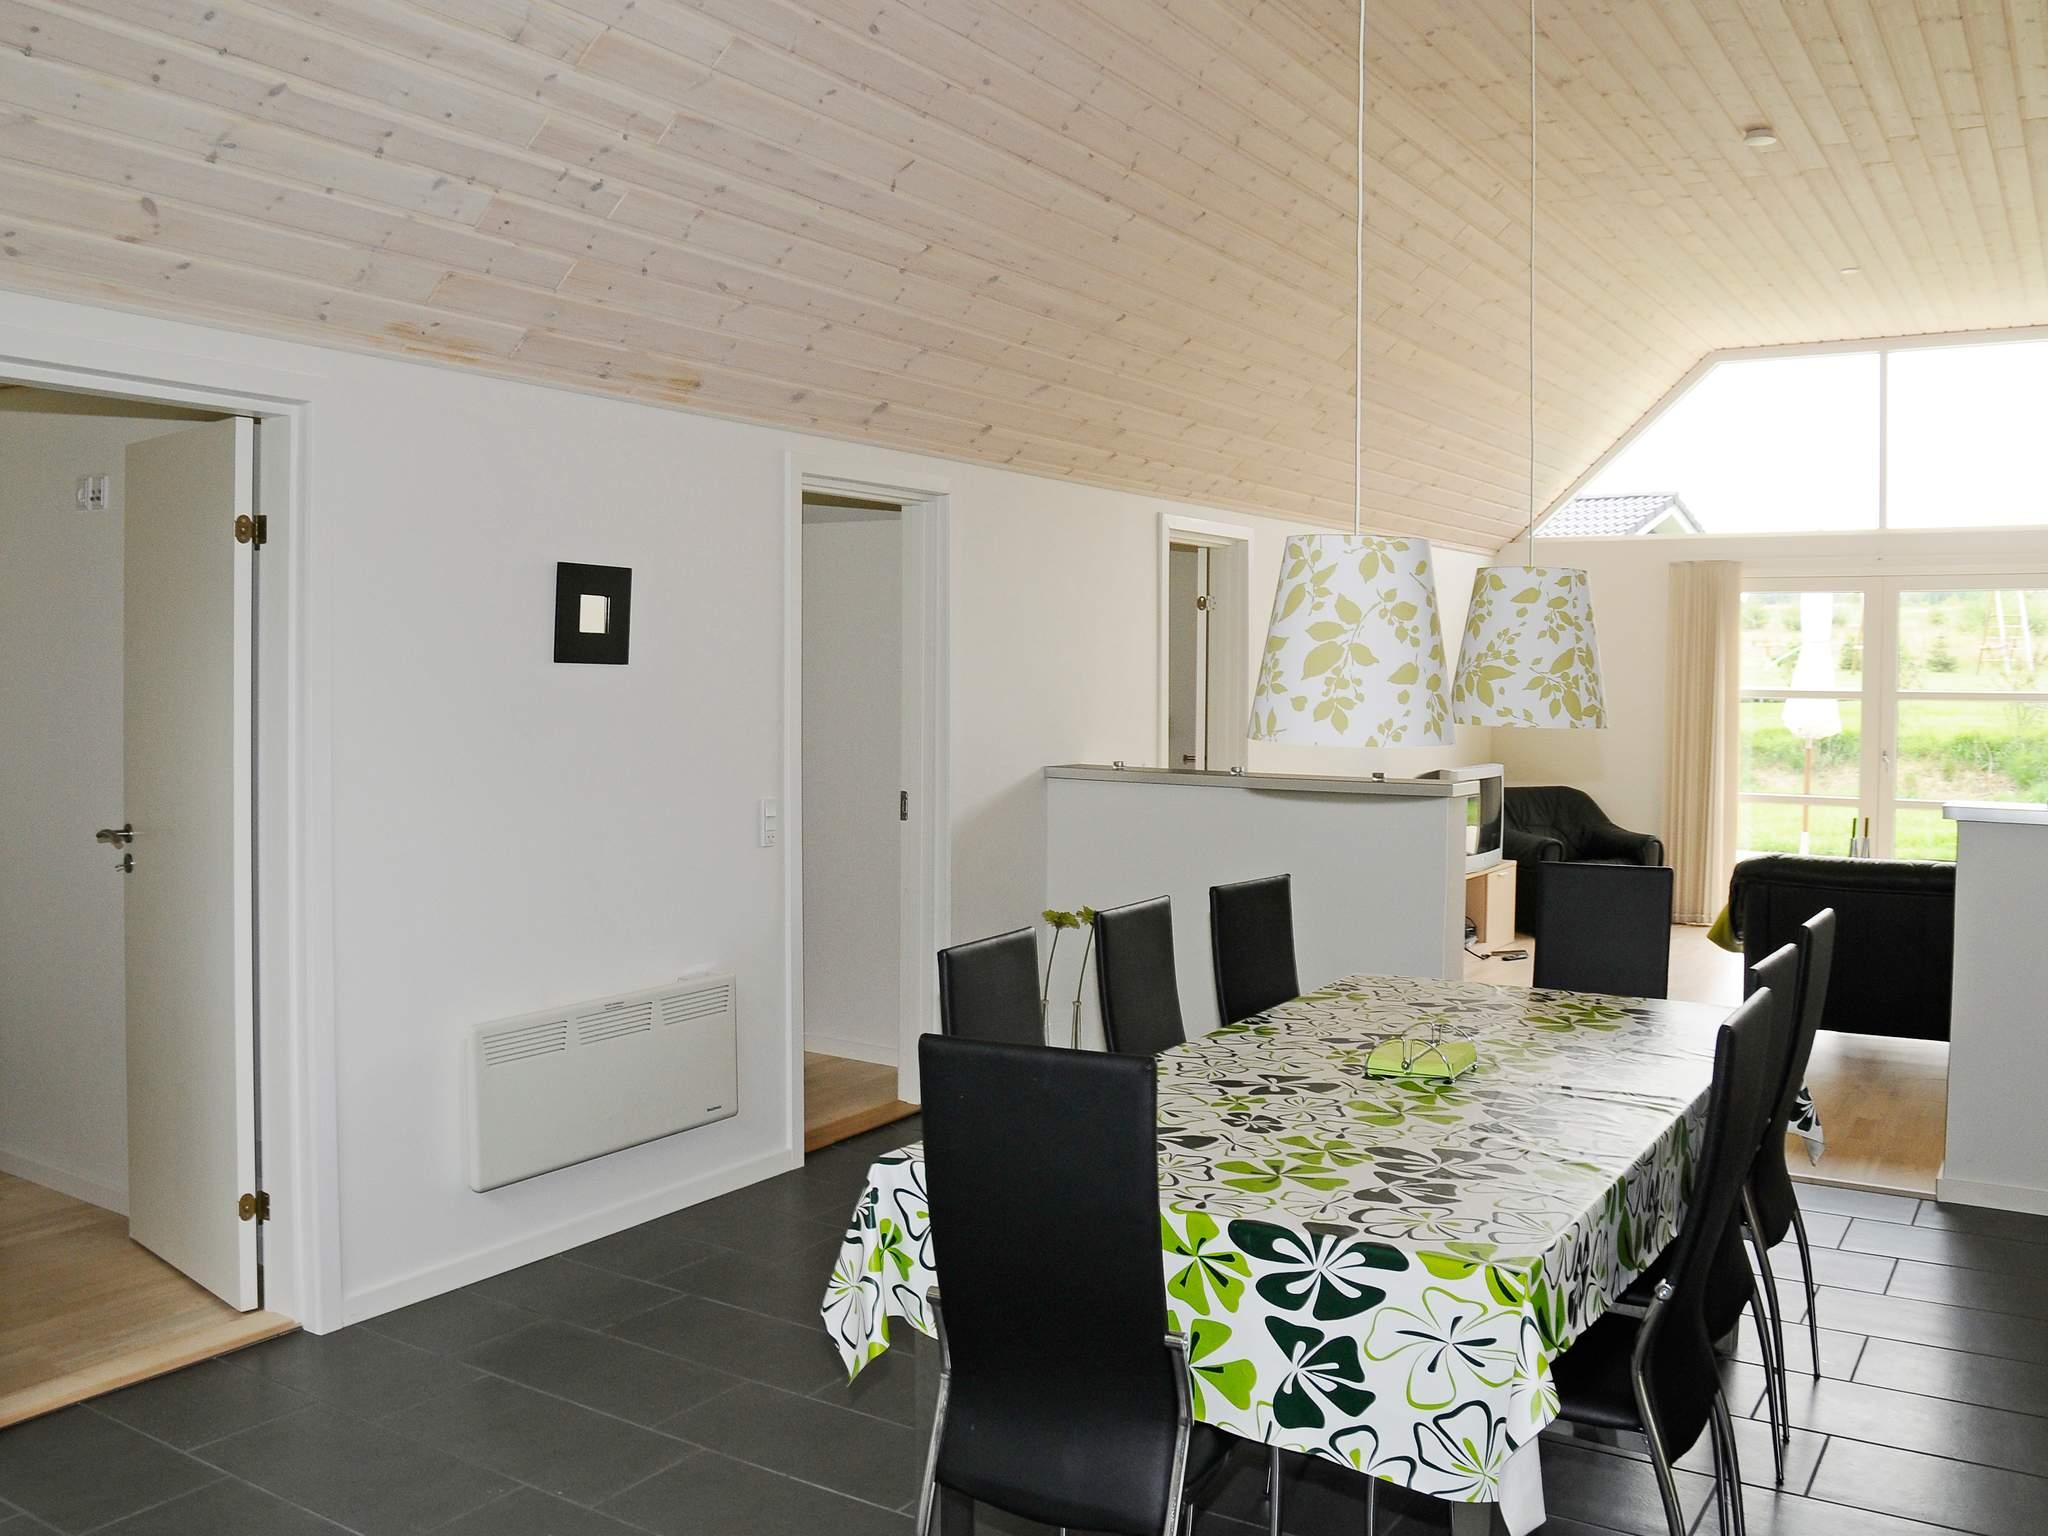 Ferienhaus Fjellerup Strand (336605), Fjellerup, , Ostjütland, Dänemark, Bild 6